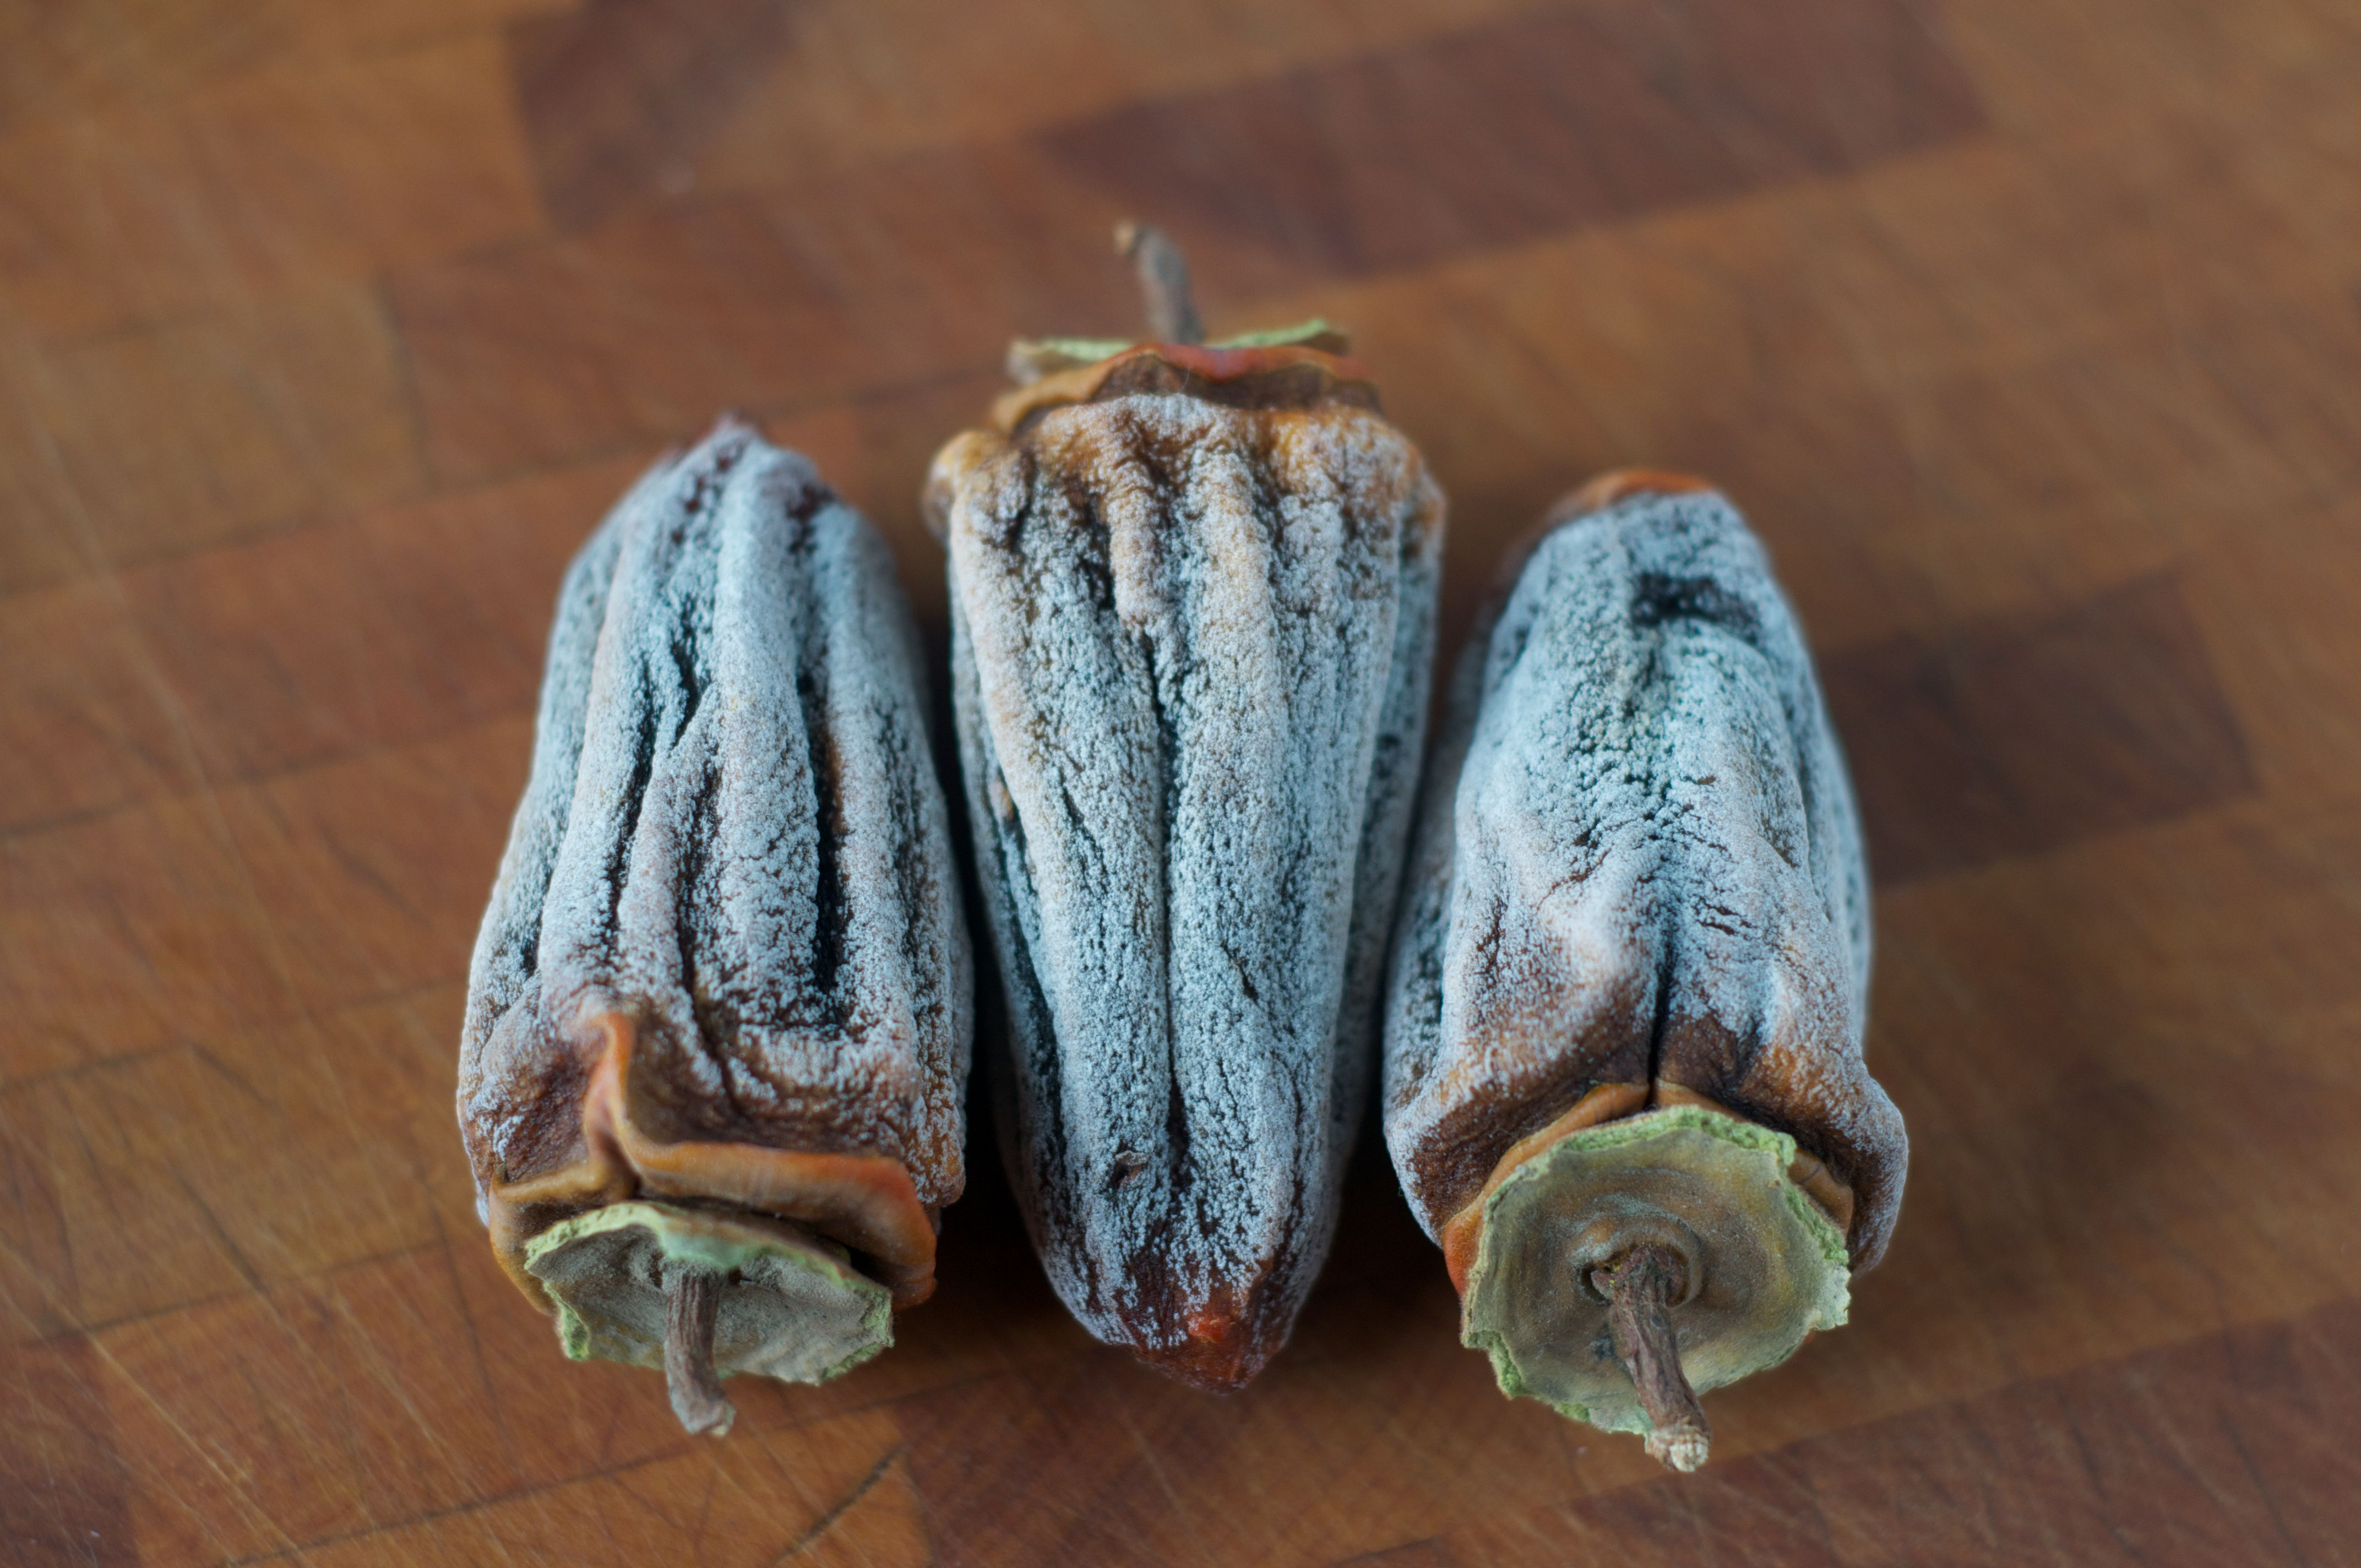 How to Make Hoshigaki Japanese Dried Persimmons